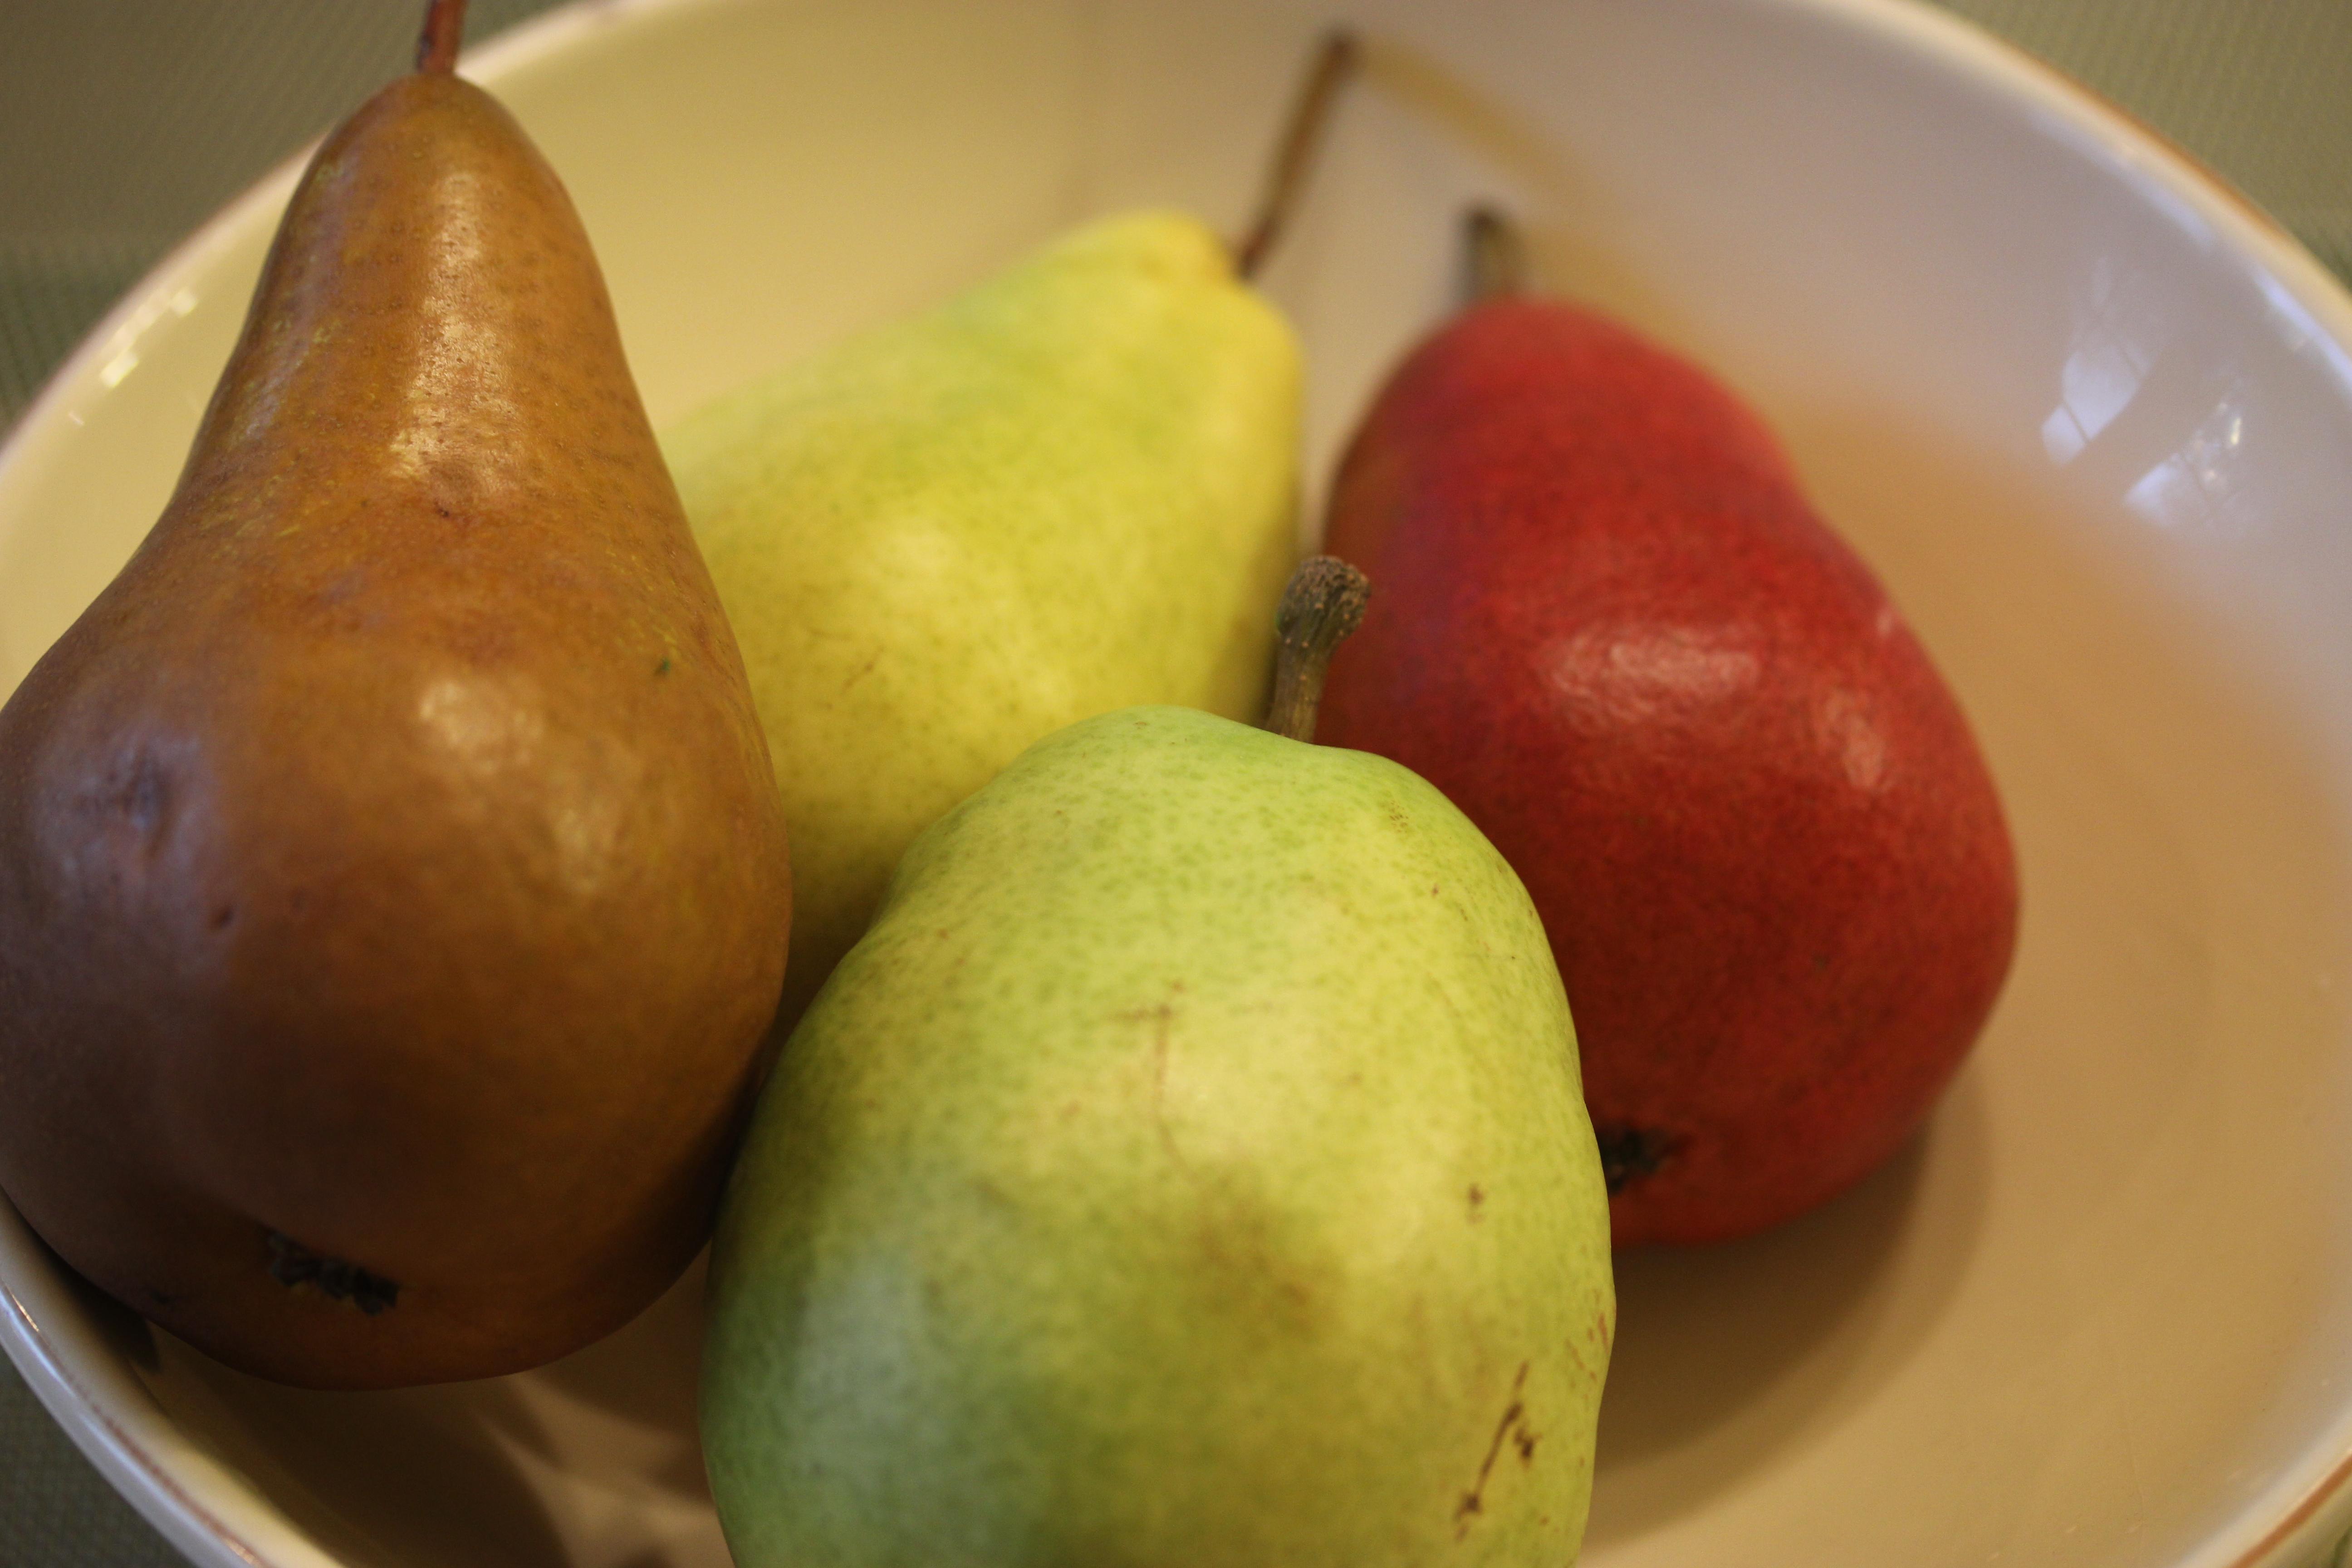 TBT Recipe: Apple Cider Vinaigrette